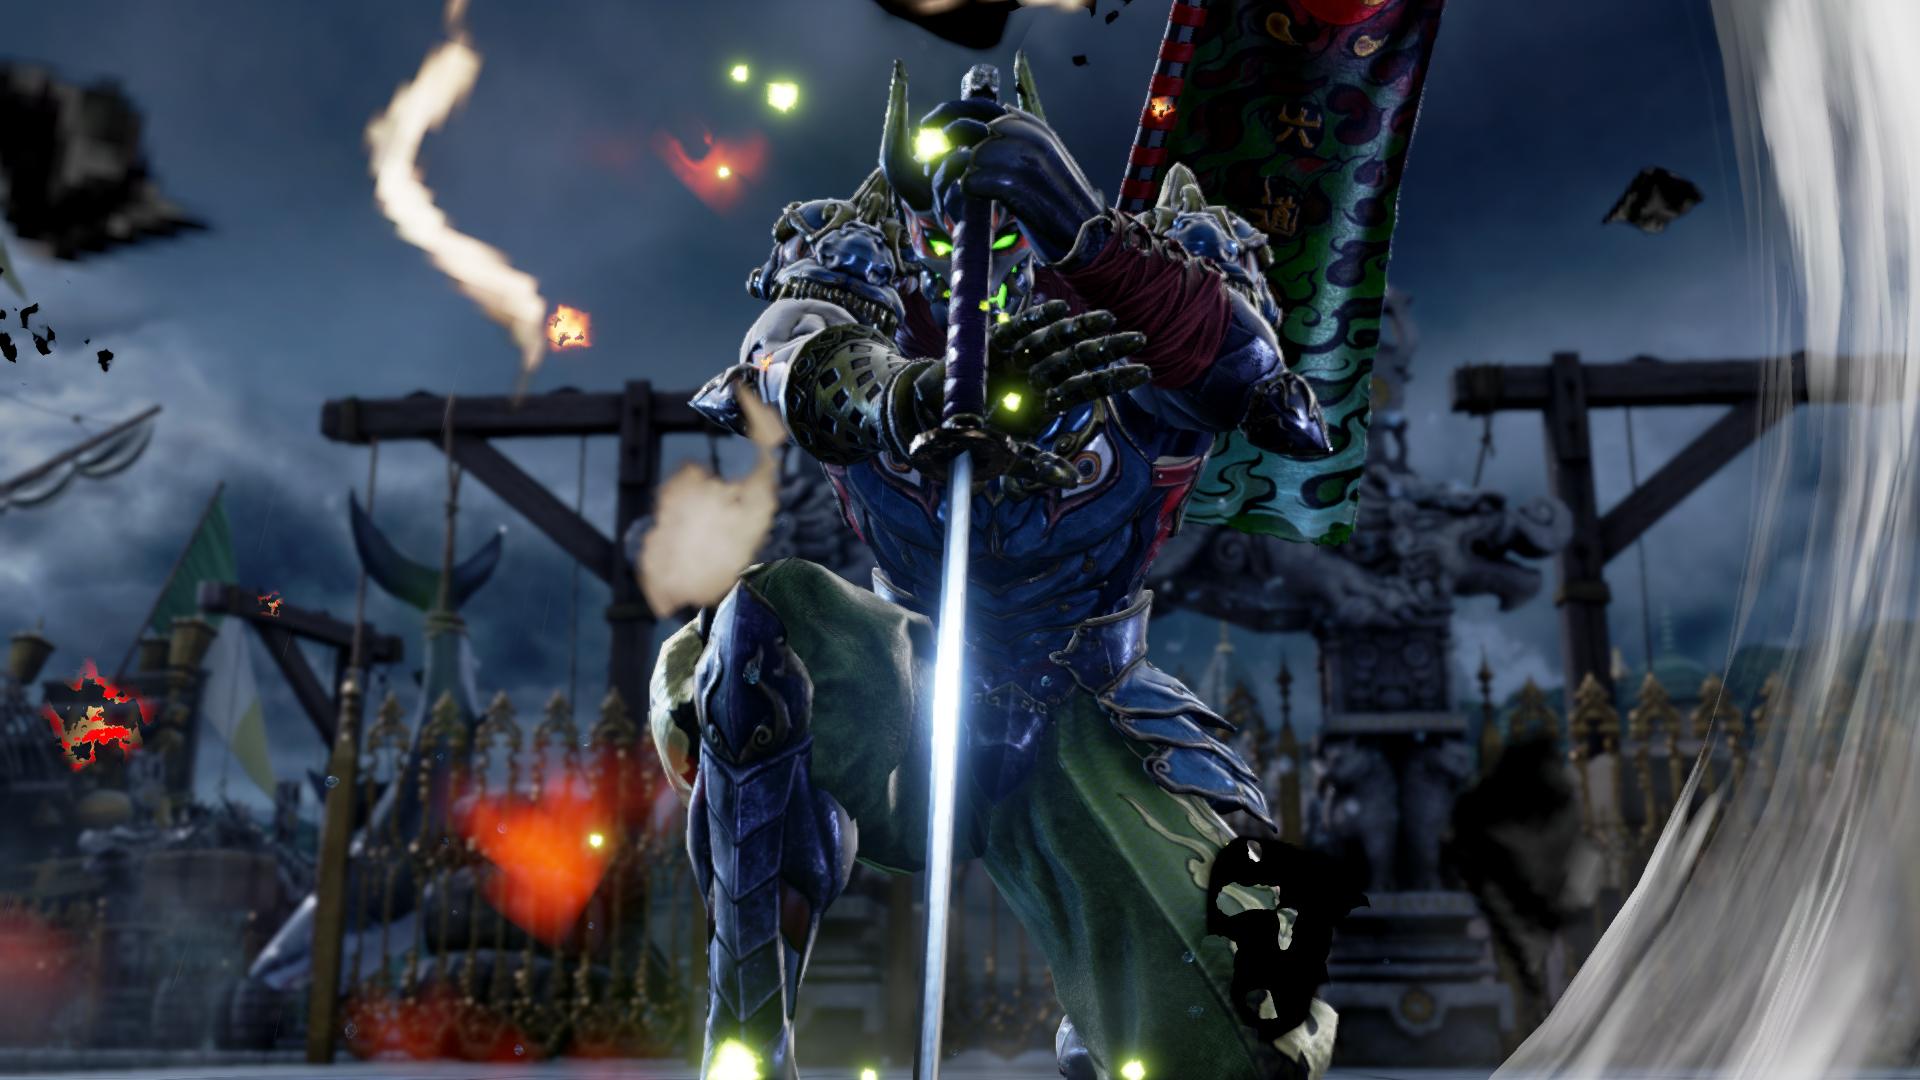 Yoshimitsu Returns In Soulcalibur 6 Opencritic